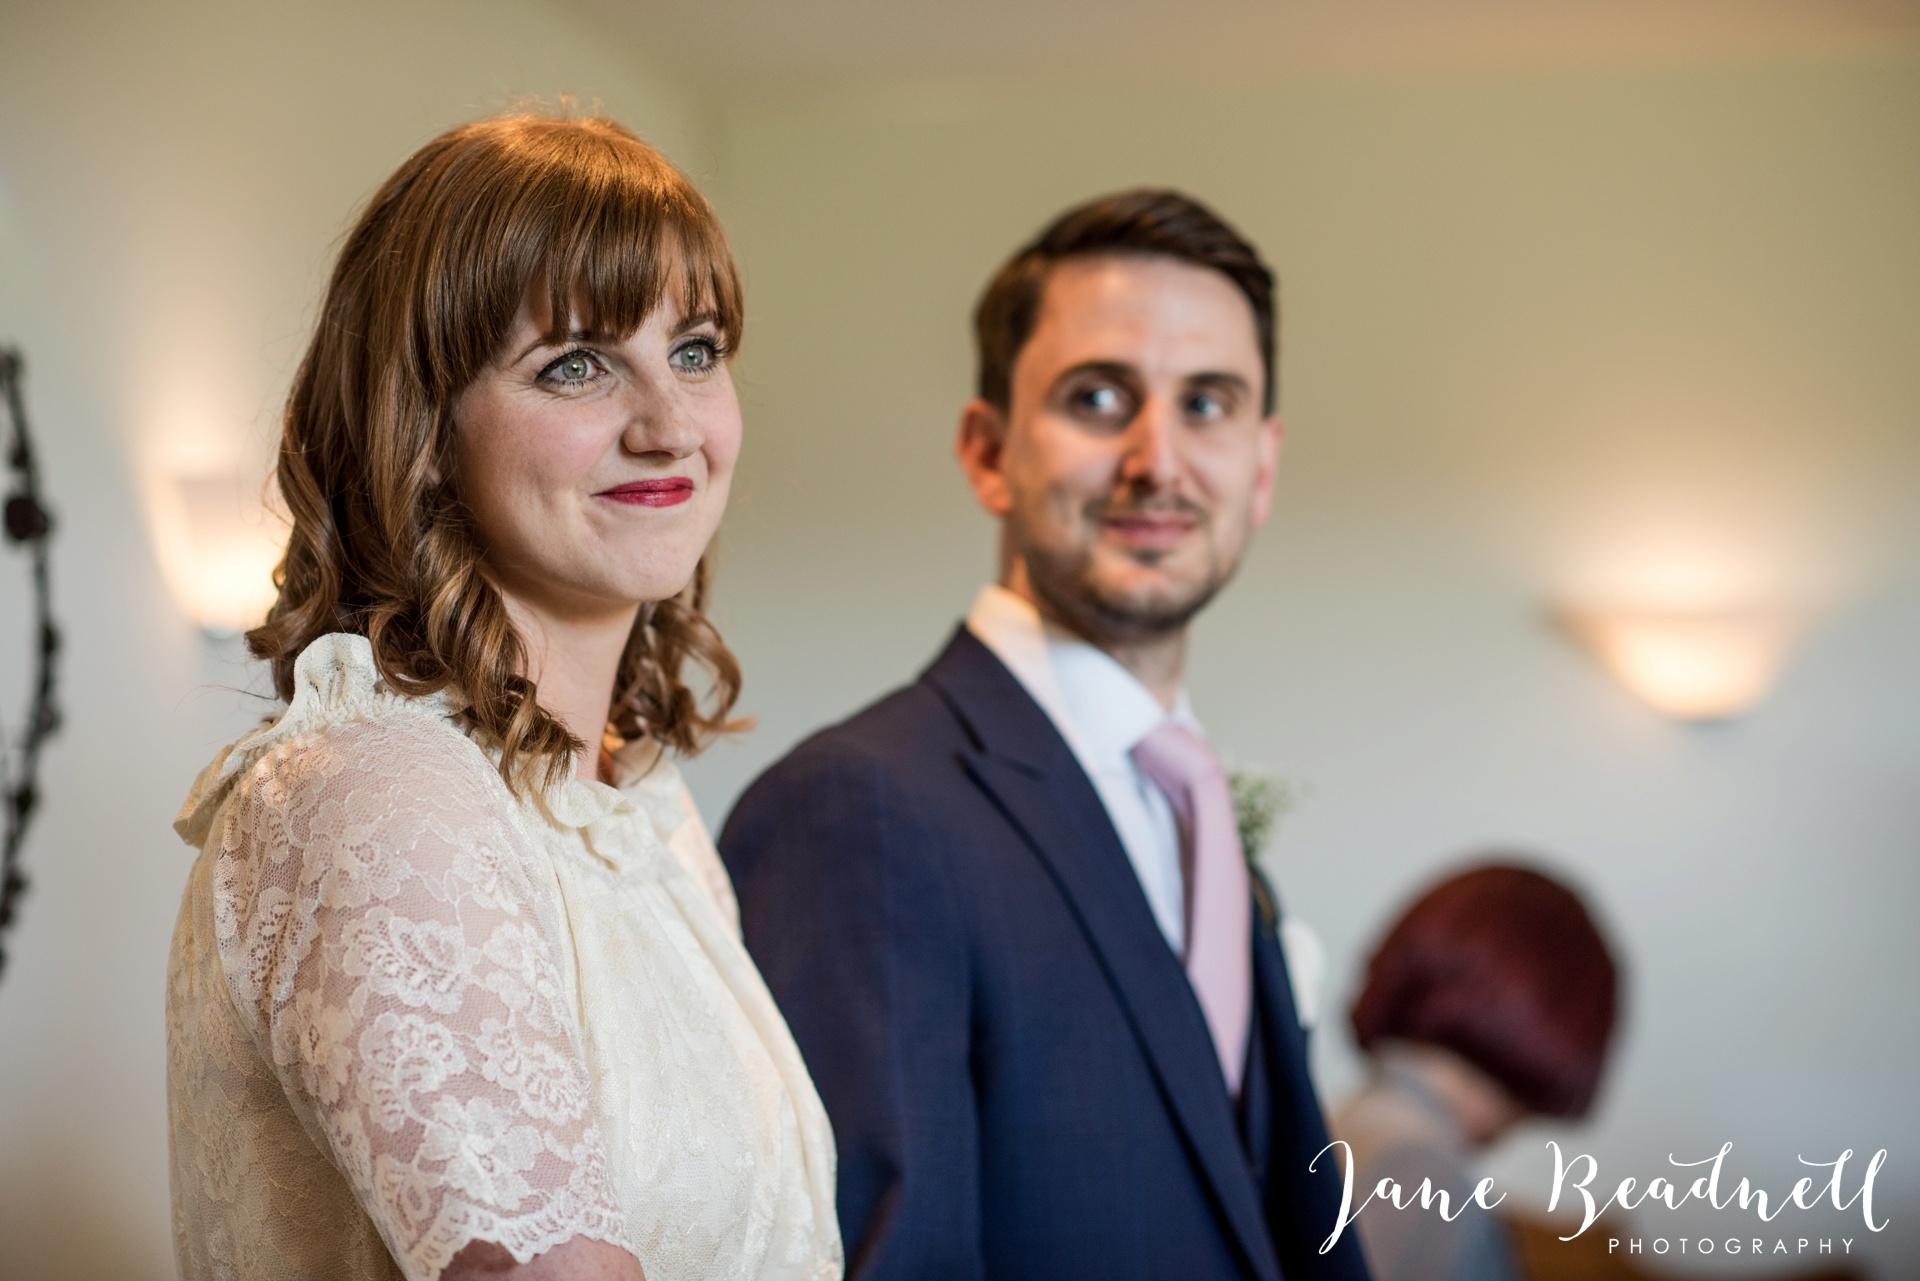 Jane Beadnell fine art wedding photographer The Cheerful Chilli Barn Otley_0020